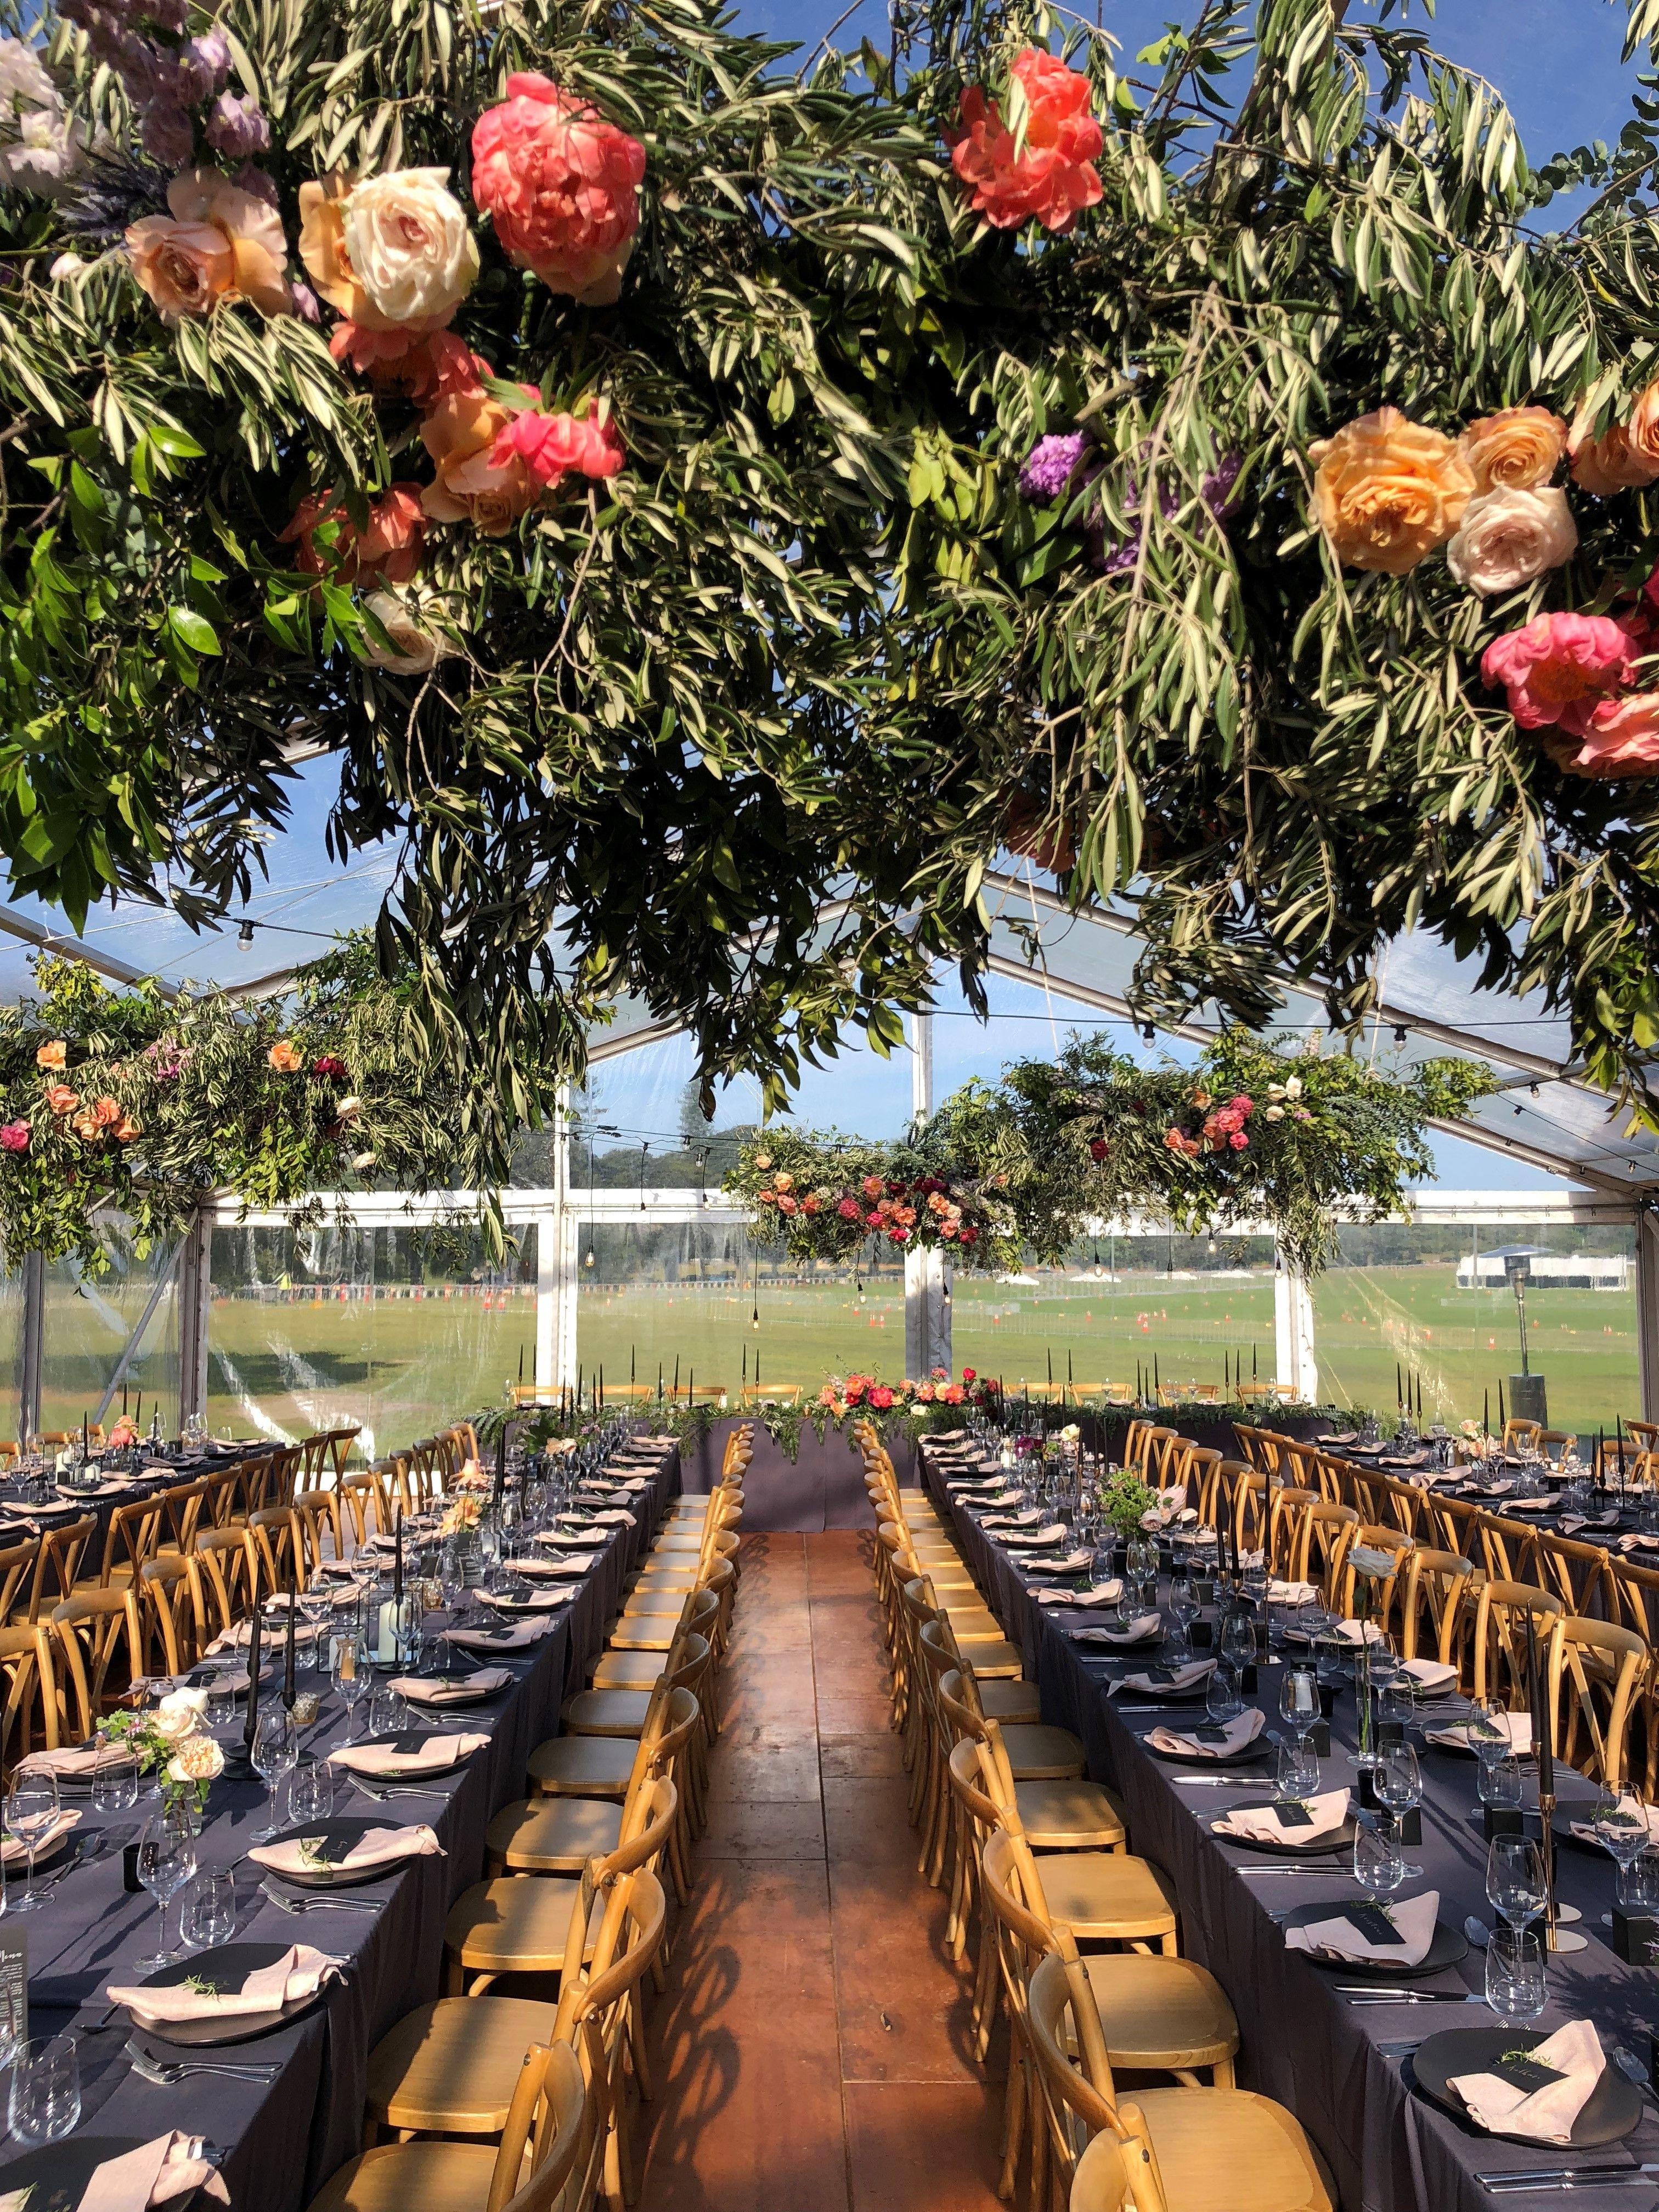 Floral Arrangements Wedding Reception Ideas Marquee Wedding Tent Hanging Florals Moody Modern Vintage Sydney Wedding Wedding Planner Marquee Wedding